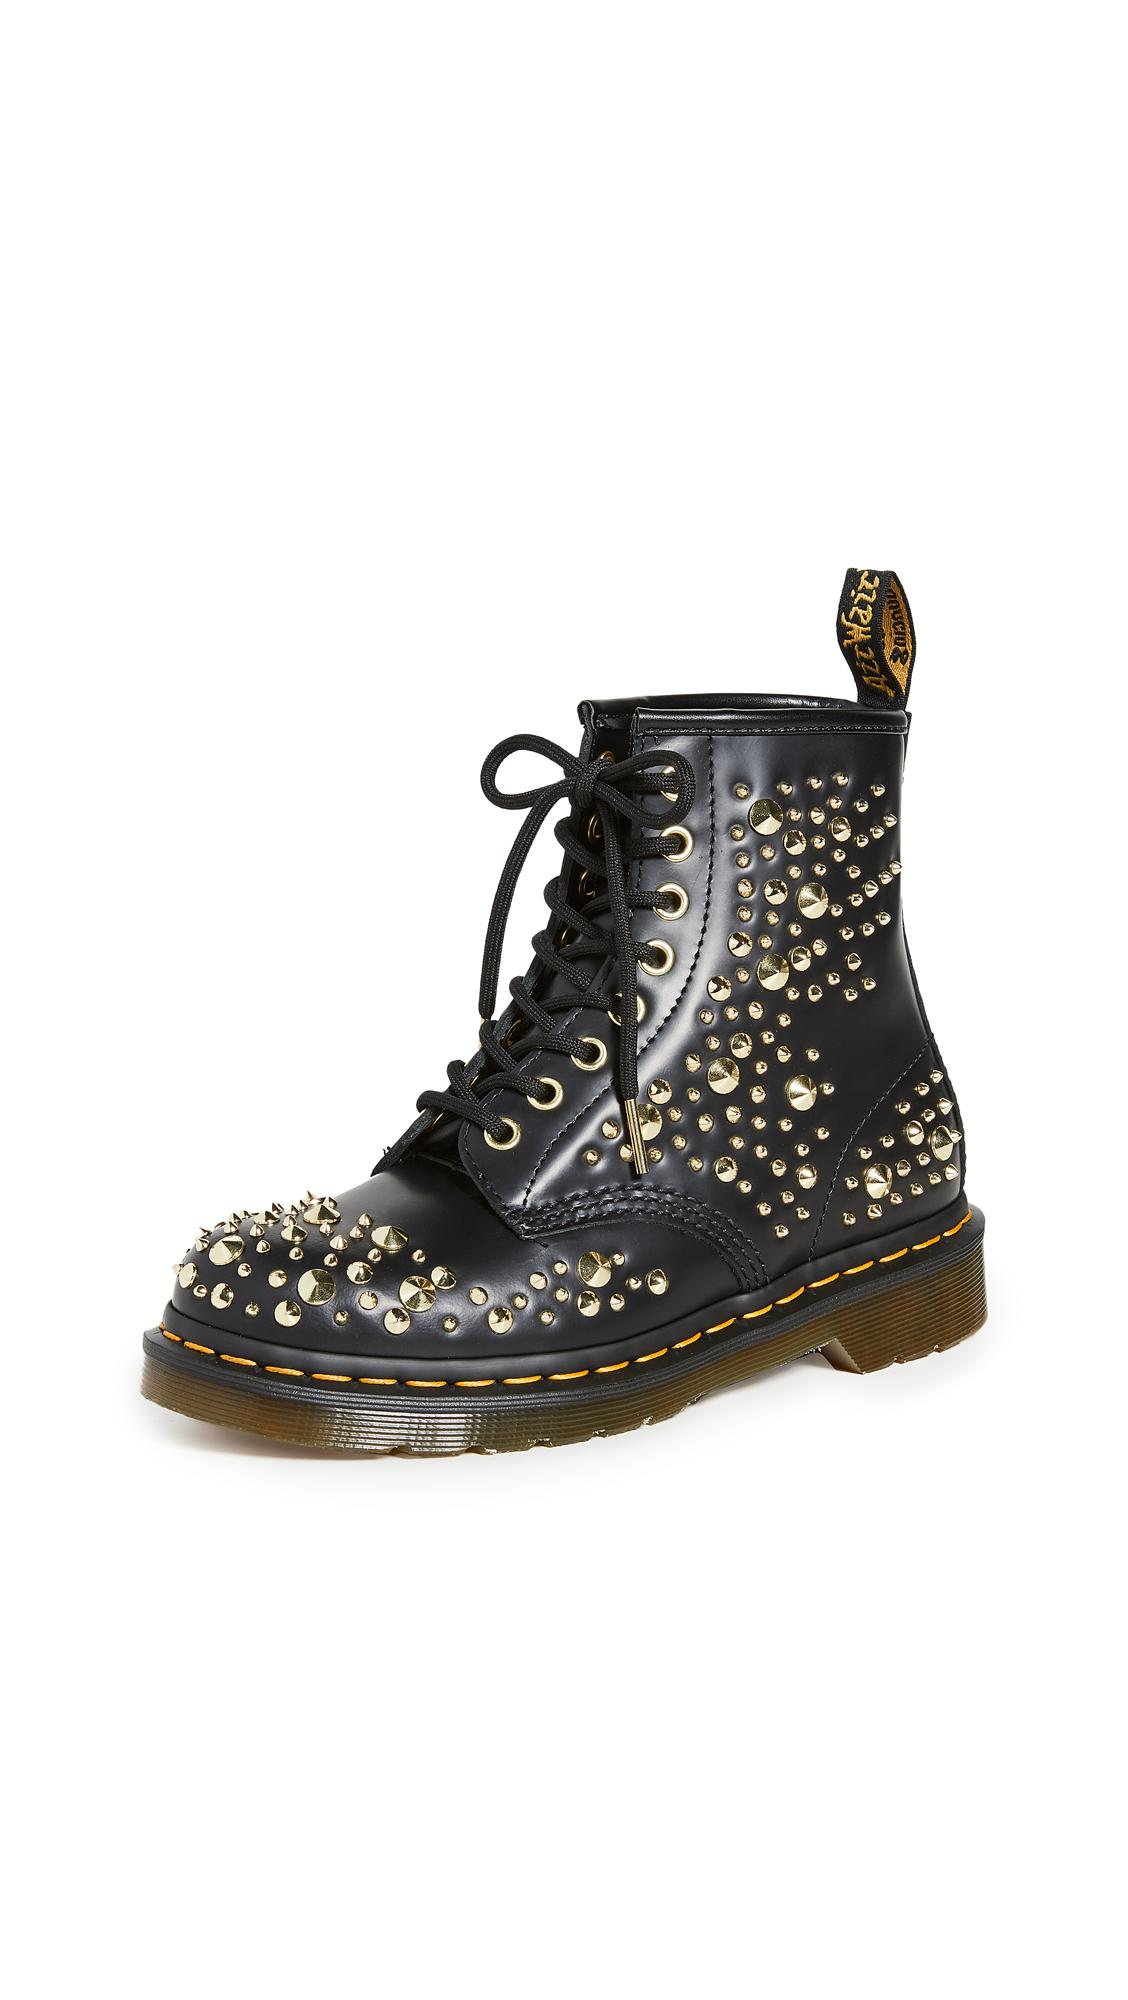 Buy Dr. Martens 1460 Deluxe Boots online, shop Dr. Martens